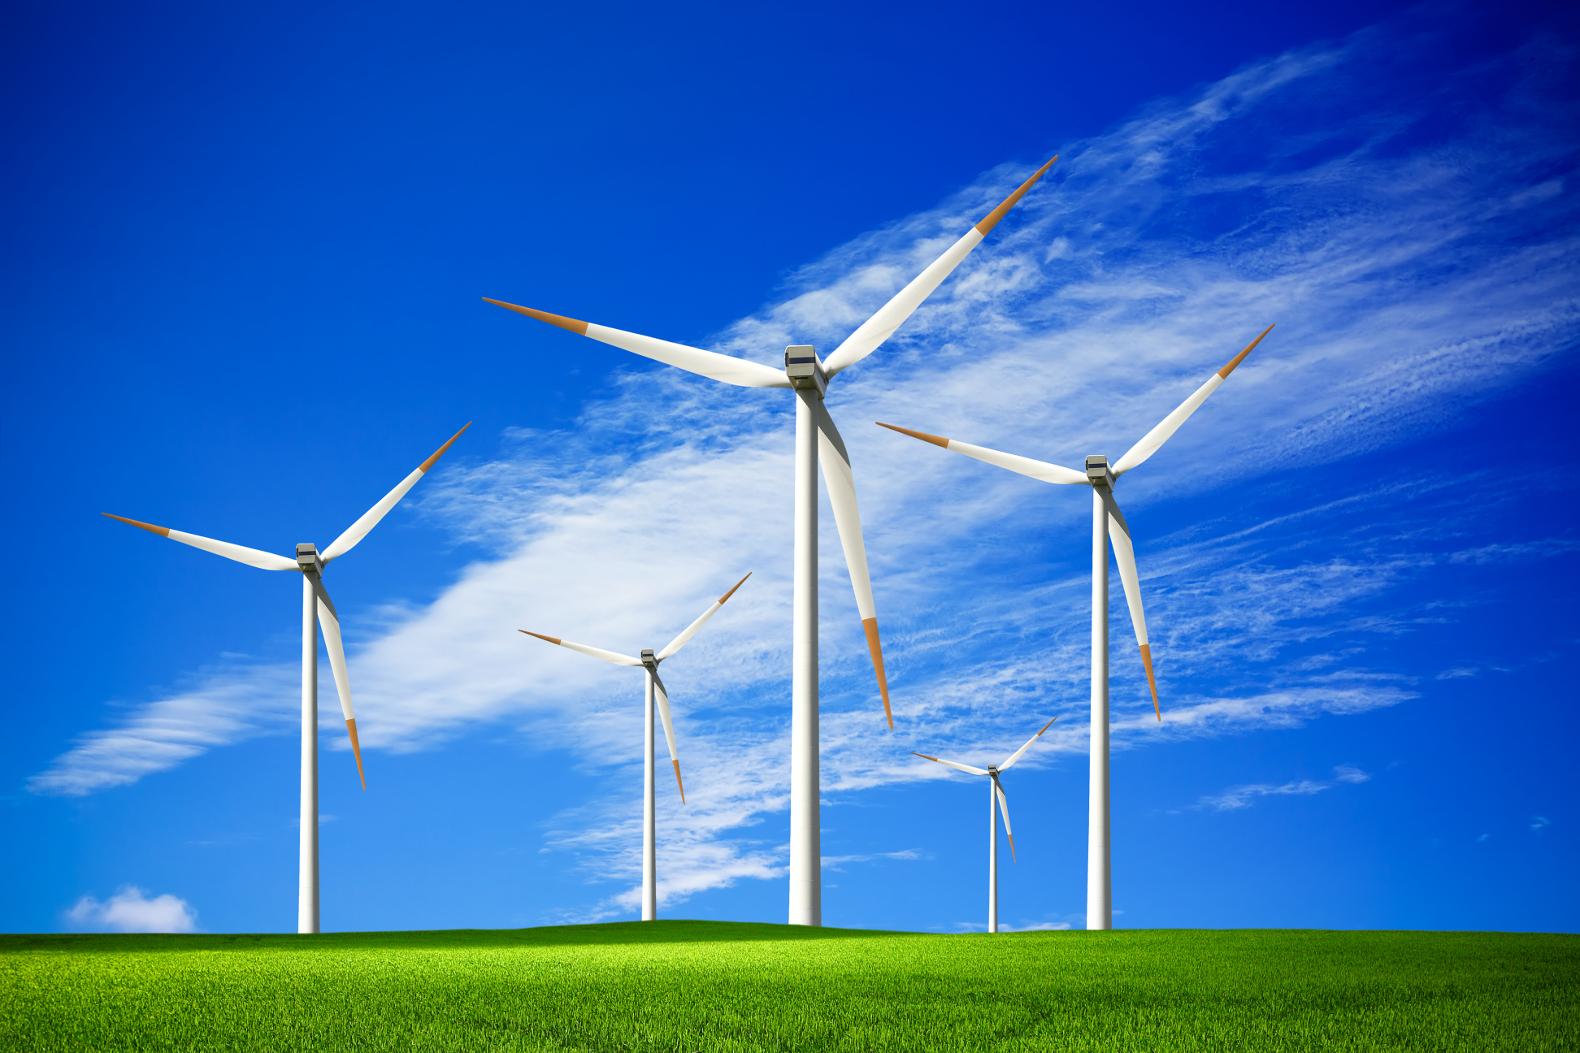 norway-wind-energy-farm